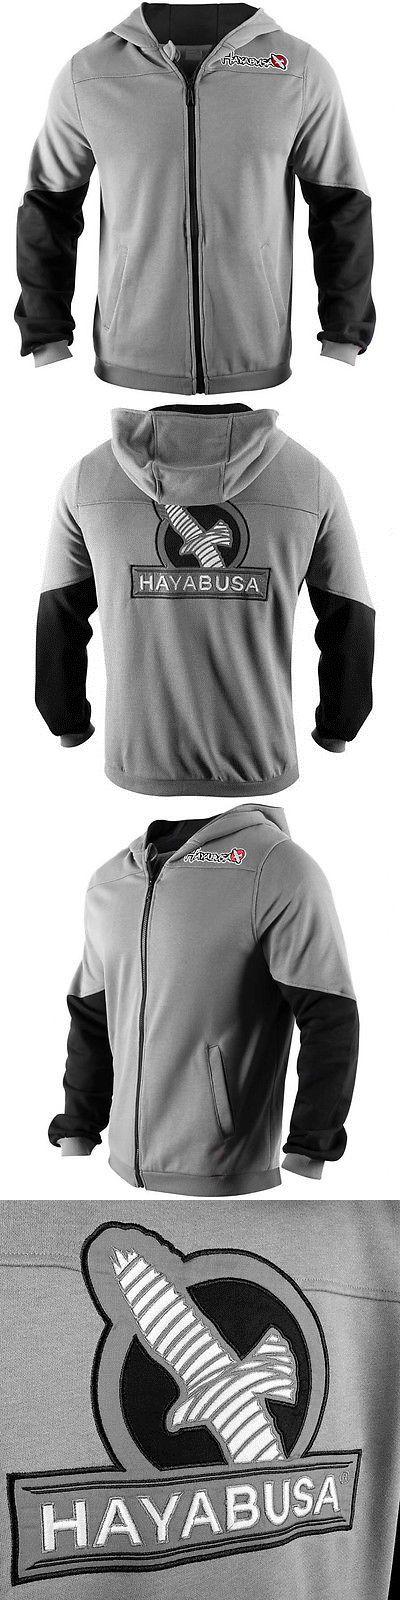 Hoodies and Sweatshirts 179770: Hayabusa Wingback Classic Fit Zip-Up Hoodie - Gray/Black-Boxing Mma Sweatshirt BUY IT NOW ONLY: $79.99